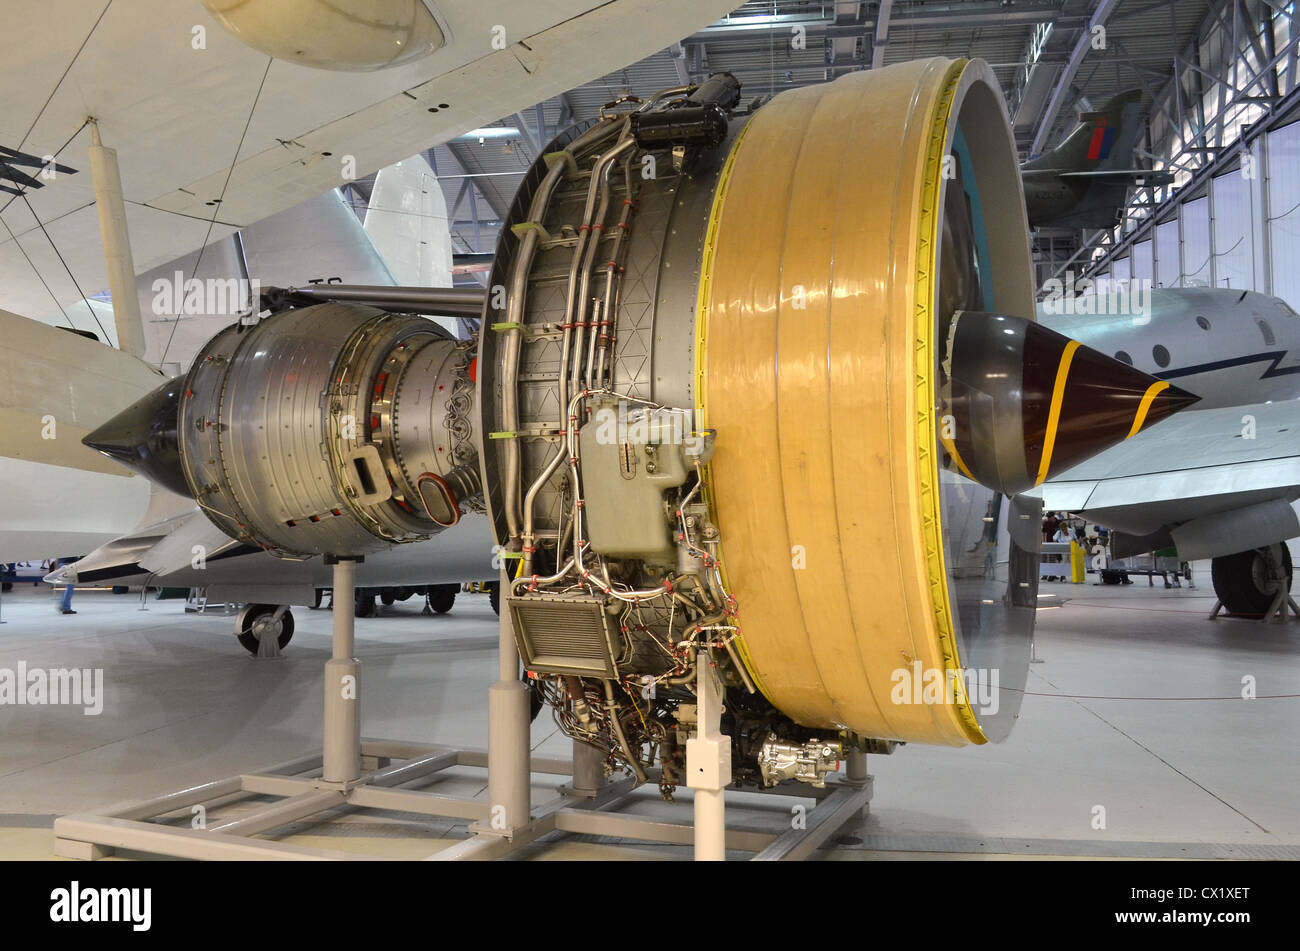 Rolls Royce Trent 800 turbofan jet engine on display at Duxford - Stock Image